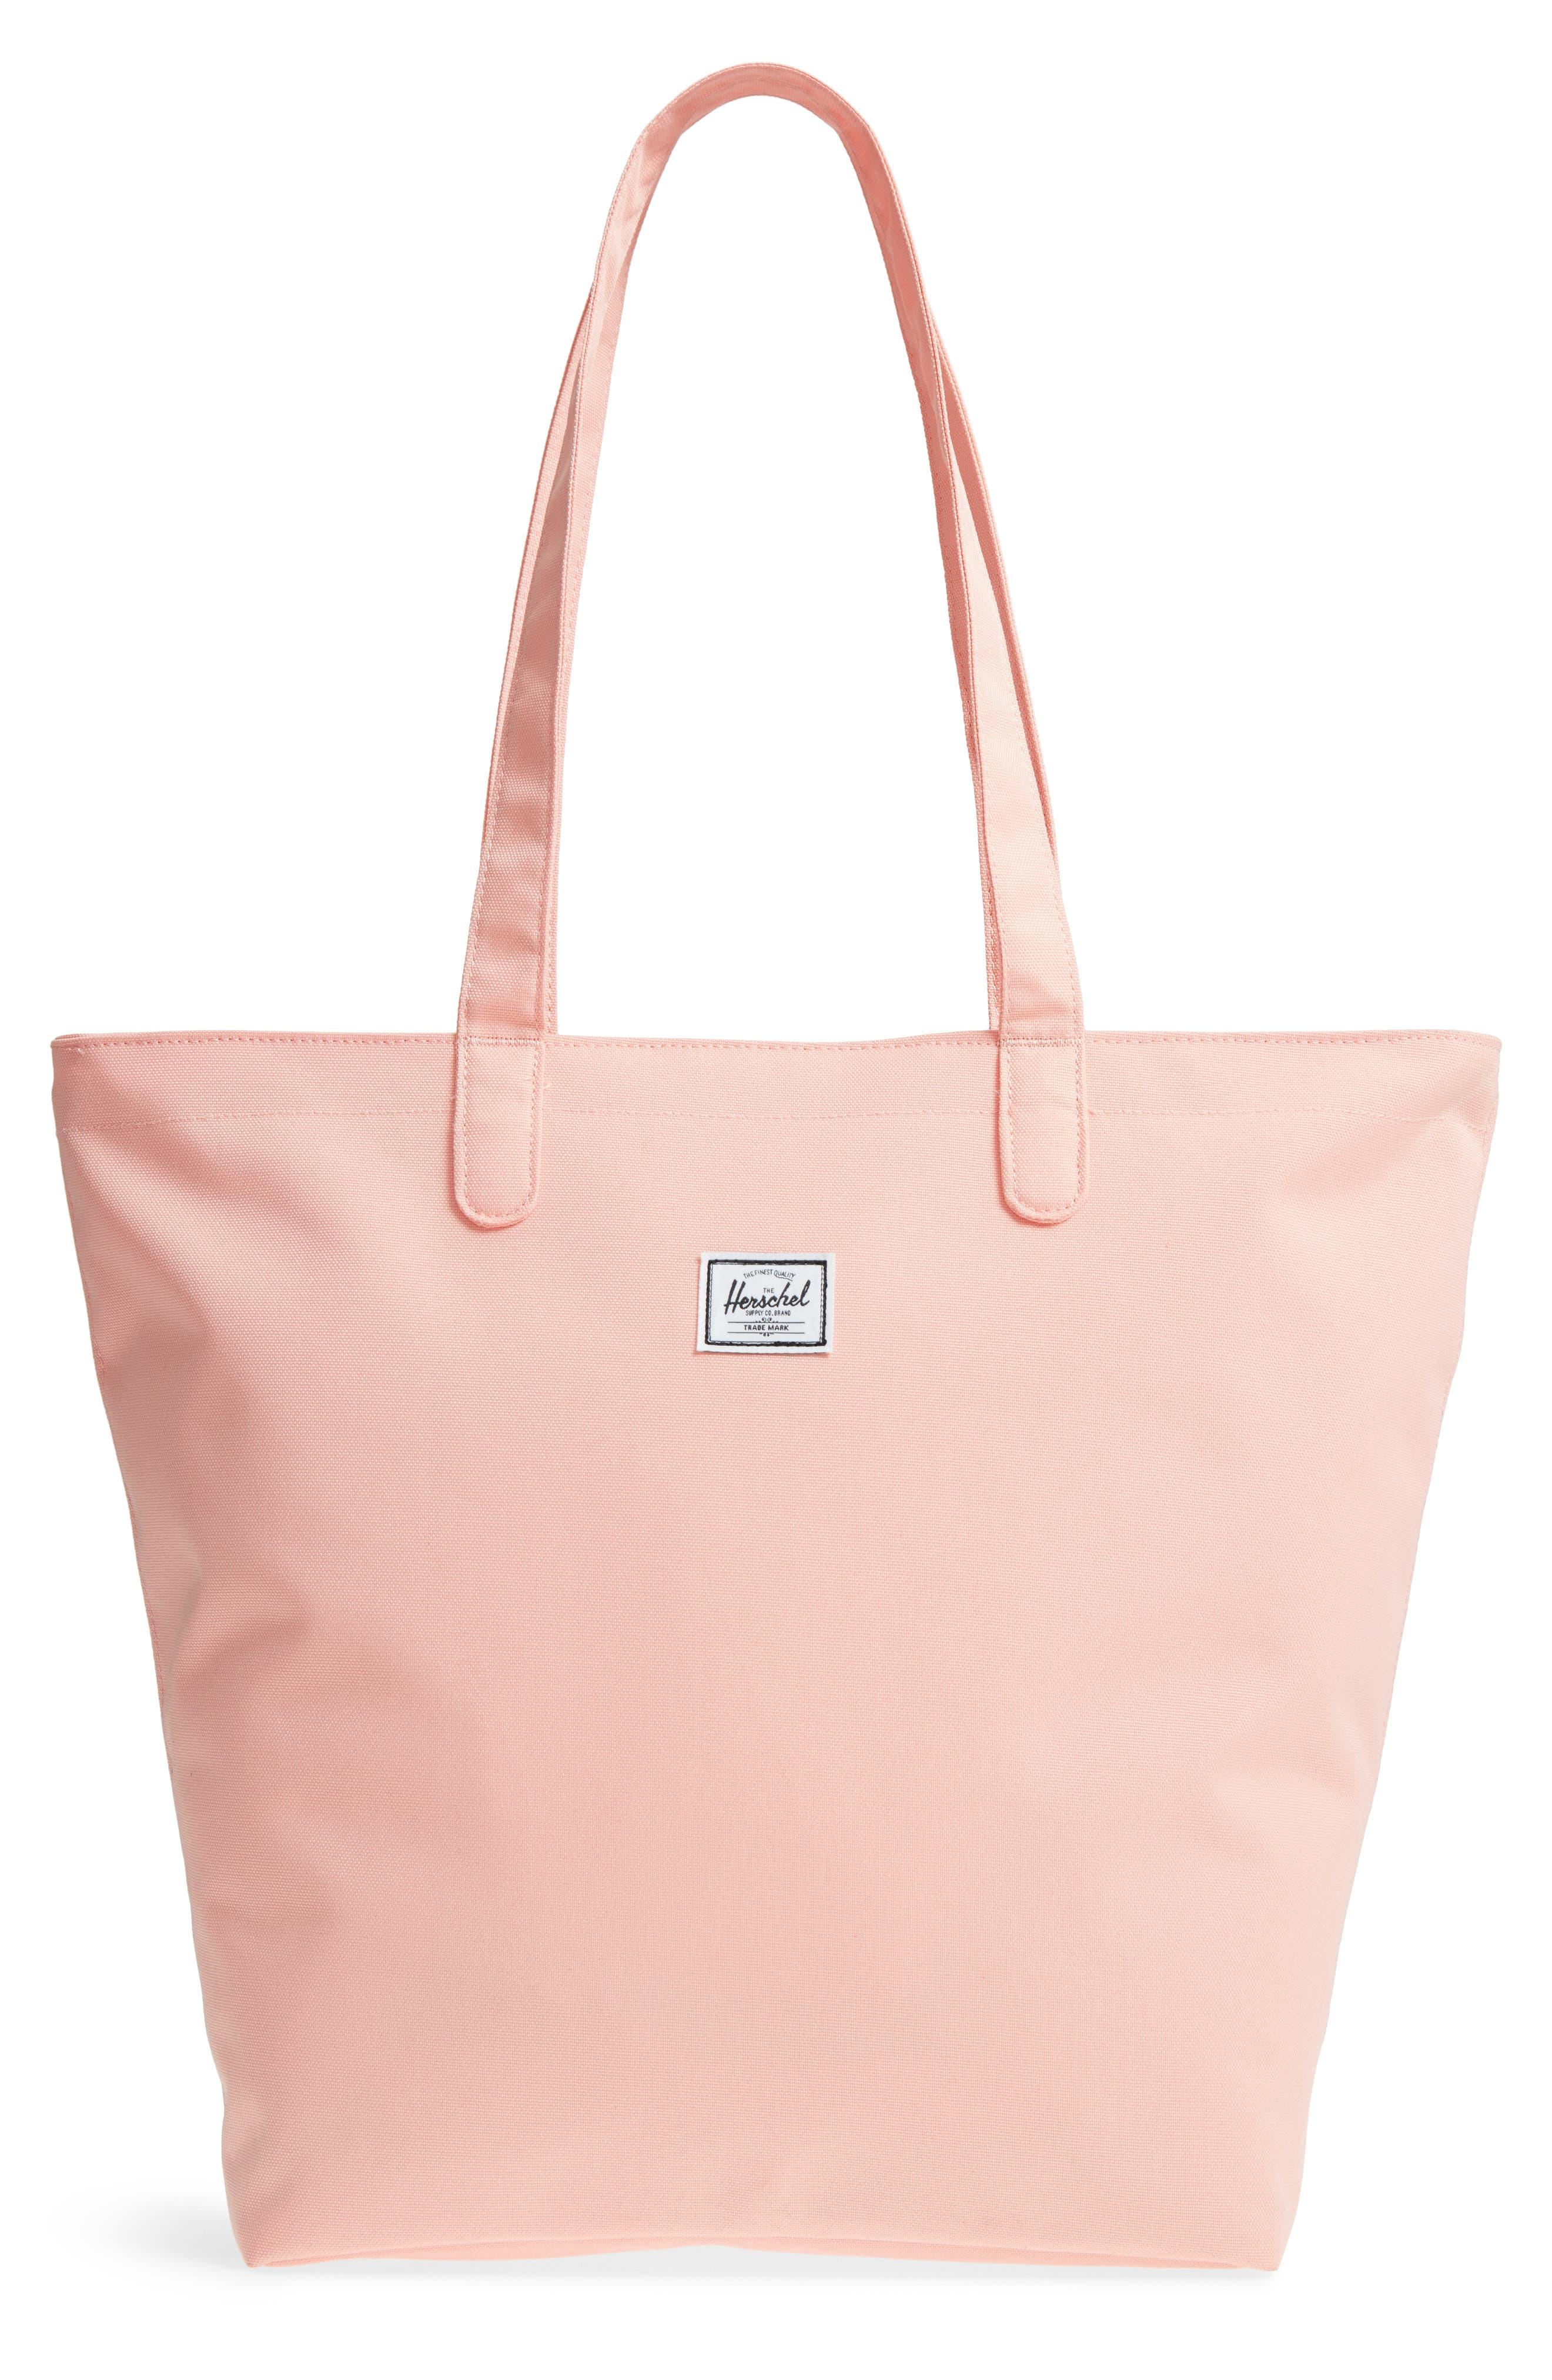 a6404371e8fb Herschel Supply Co. Mica Canvas Tote - Pink In Peach